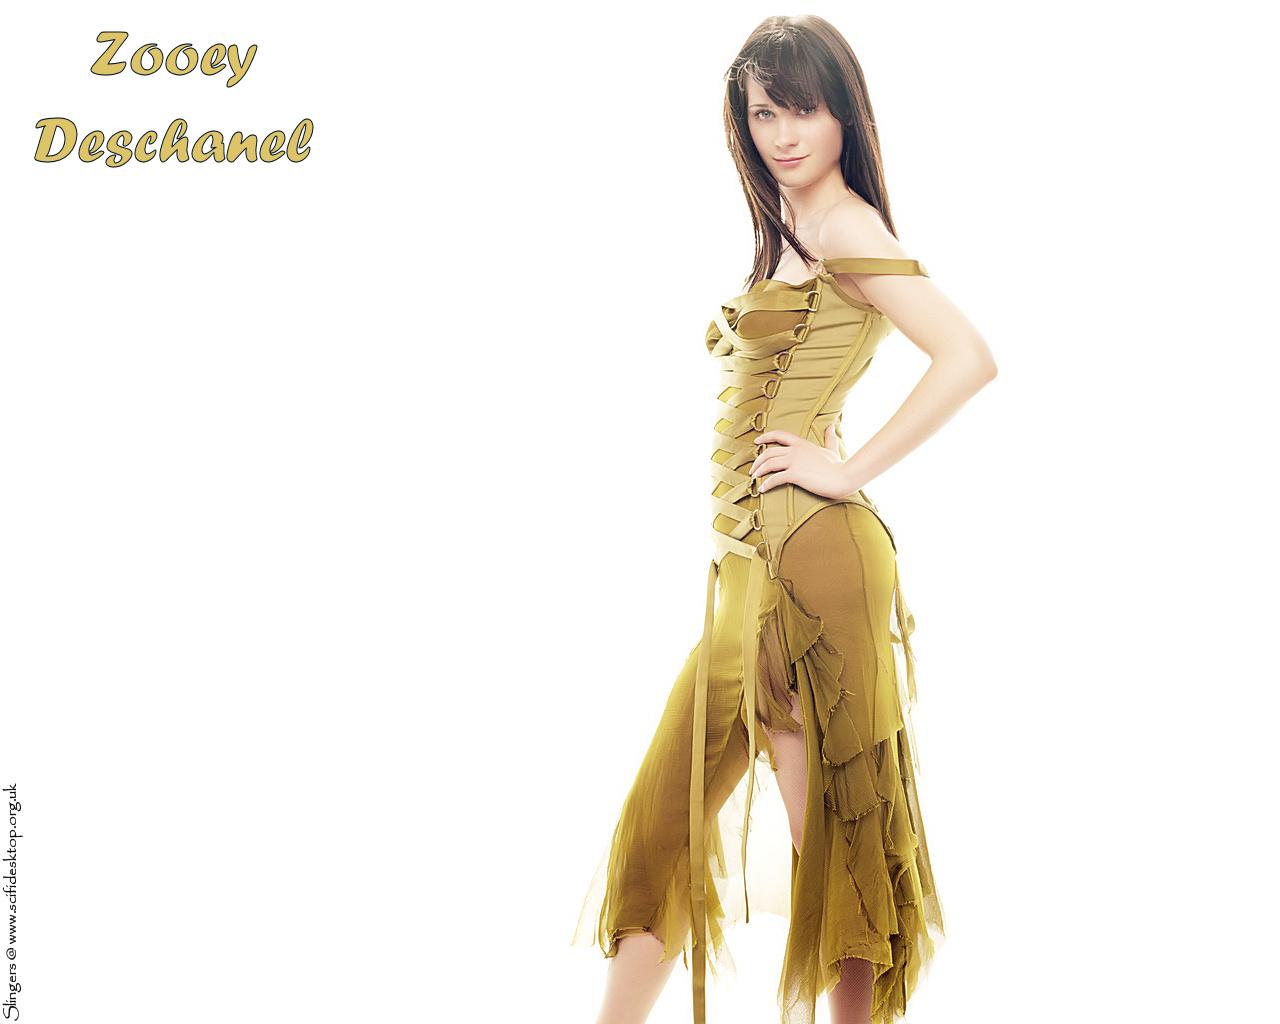 http://4.bp.blogspot.com/_BpAoKRSdVjQ/TOVBmM8QHDI/AAAAAAAAC5c/-1zYqrdtRVc/s1600/Zooey-Deschanel-celebrities.jpg